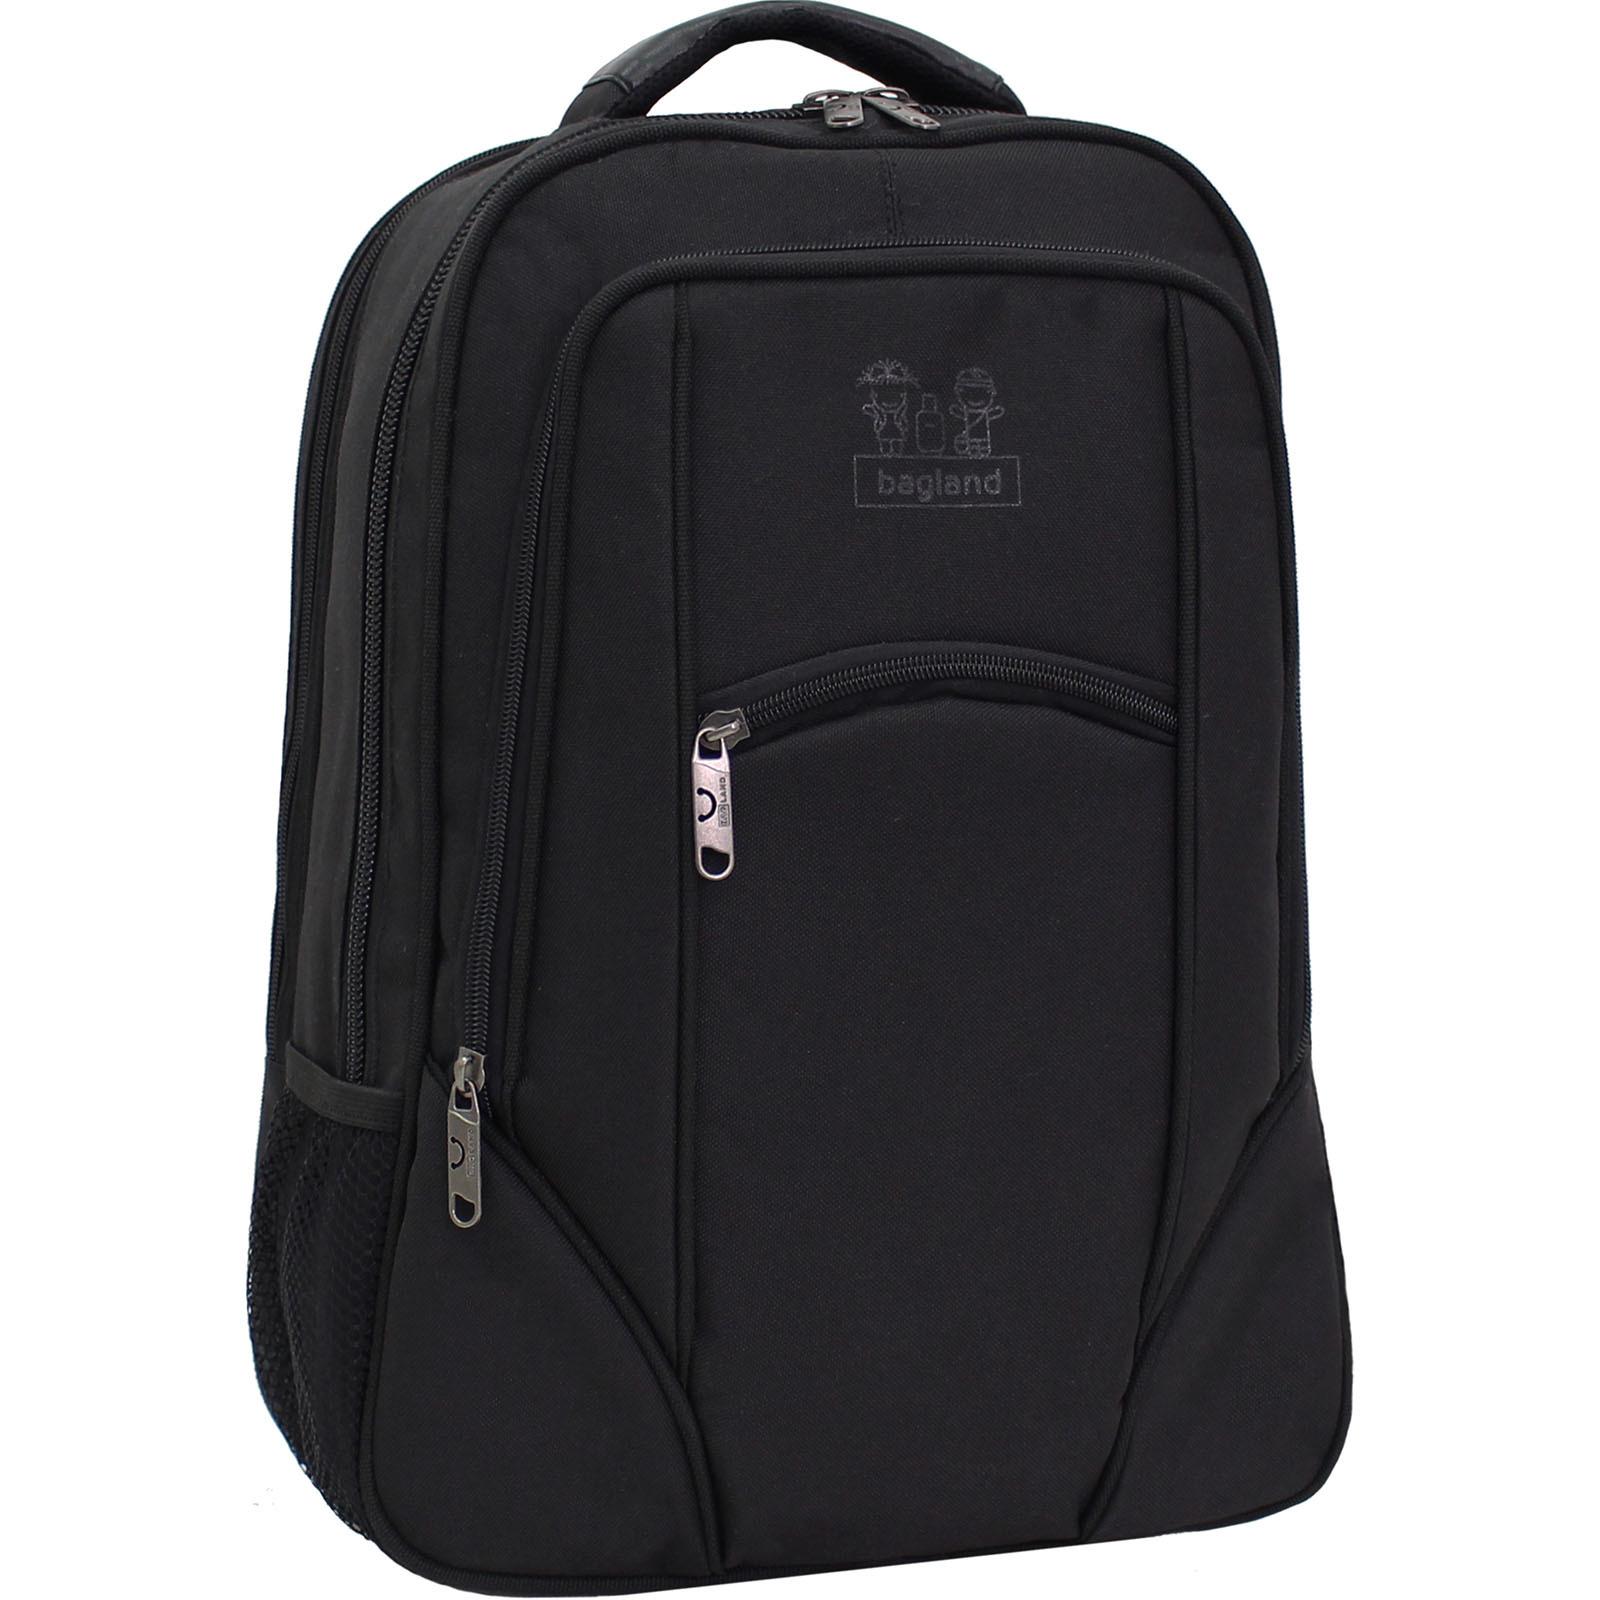 Рюкзаки для ноутбука Рюкзак для ноутбука Bagland Рюкзак под ноутбук 537 21 л. Чёрный (0053766) IMG_9978.JPG